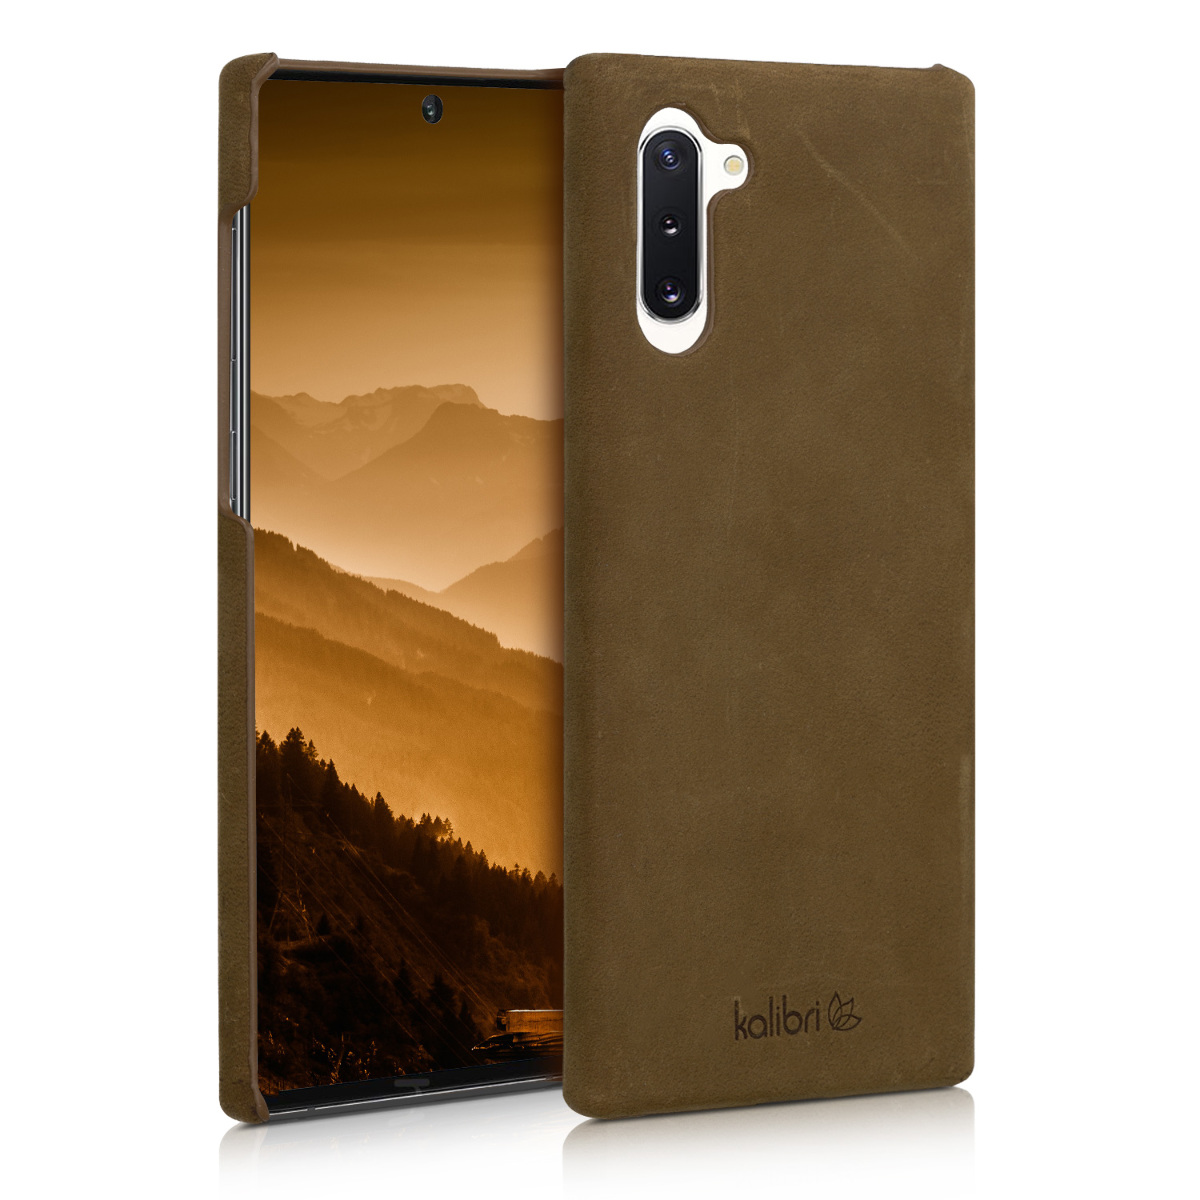 Kalibri Σκληρή Δερμάτινη Θήκη Samsung Galaxy Note 10 - Brown (49278.05)